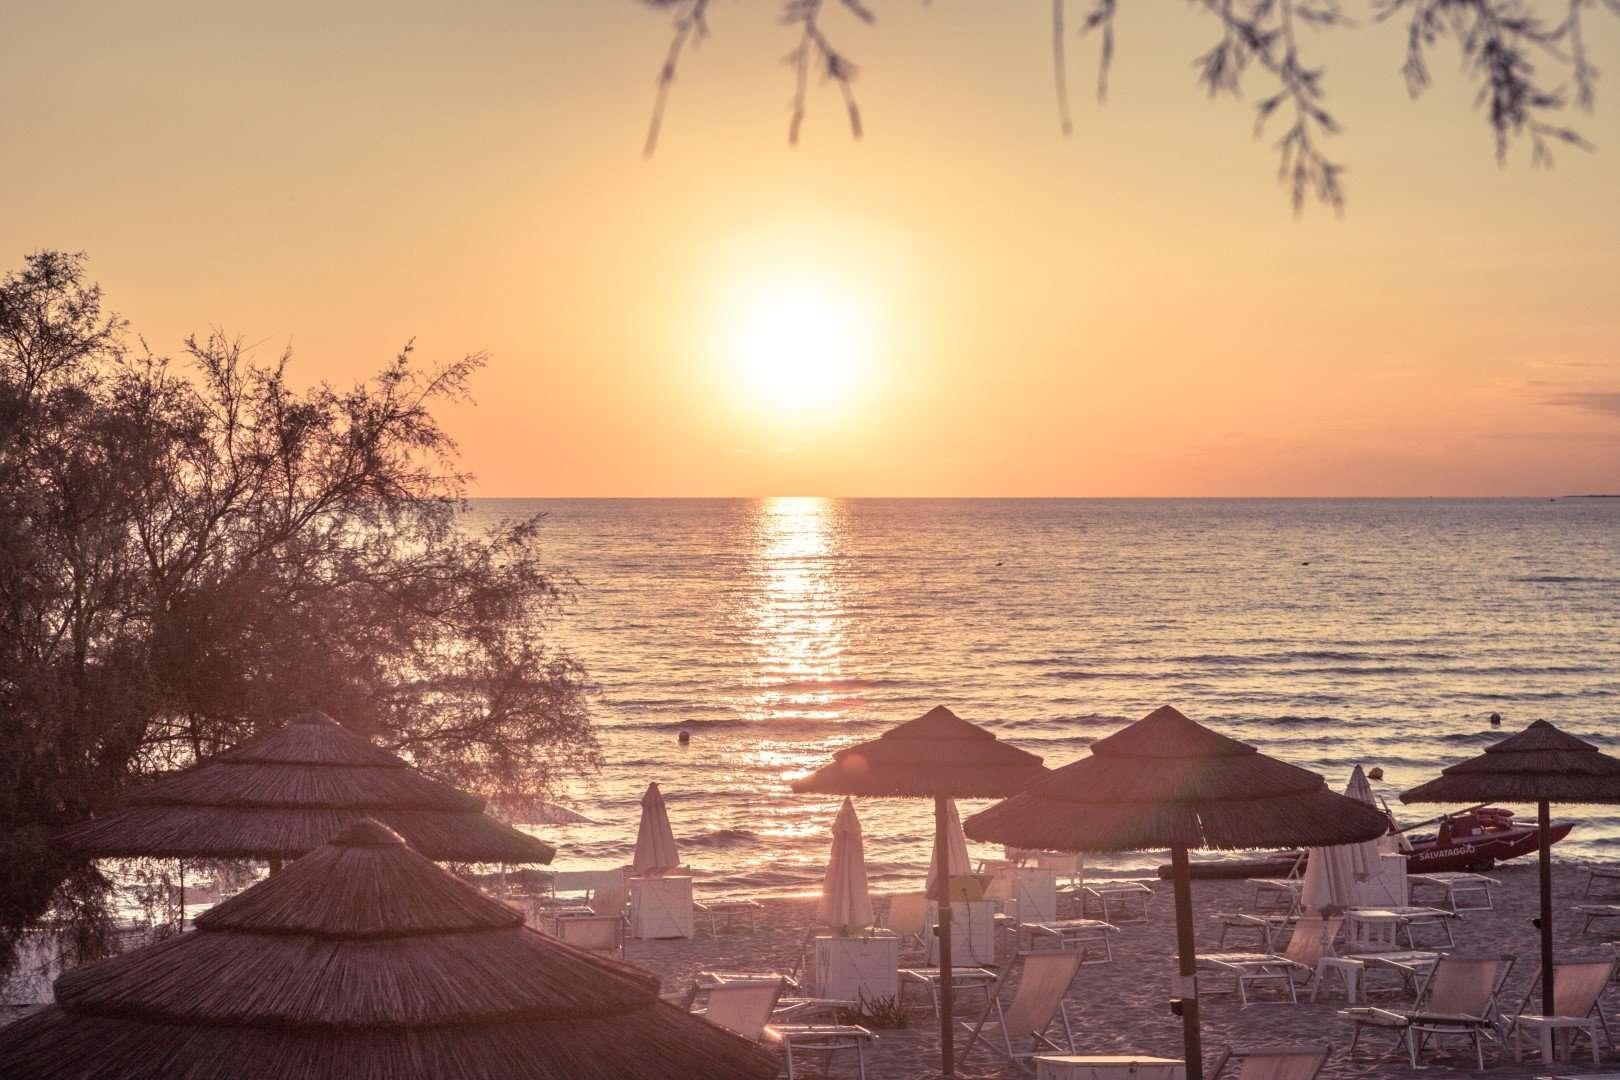 hotel costa brada - gallipoli - puglia - italie - strand